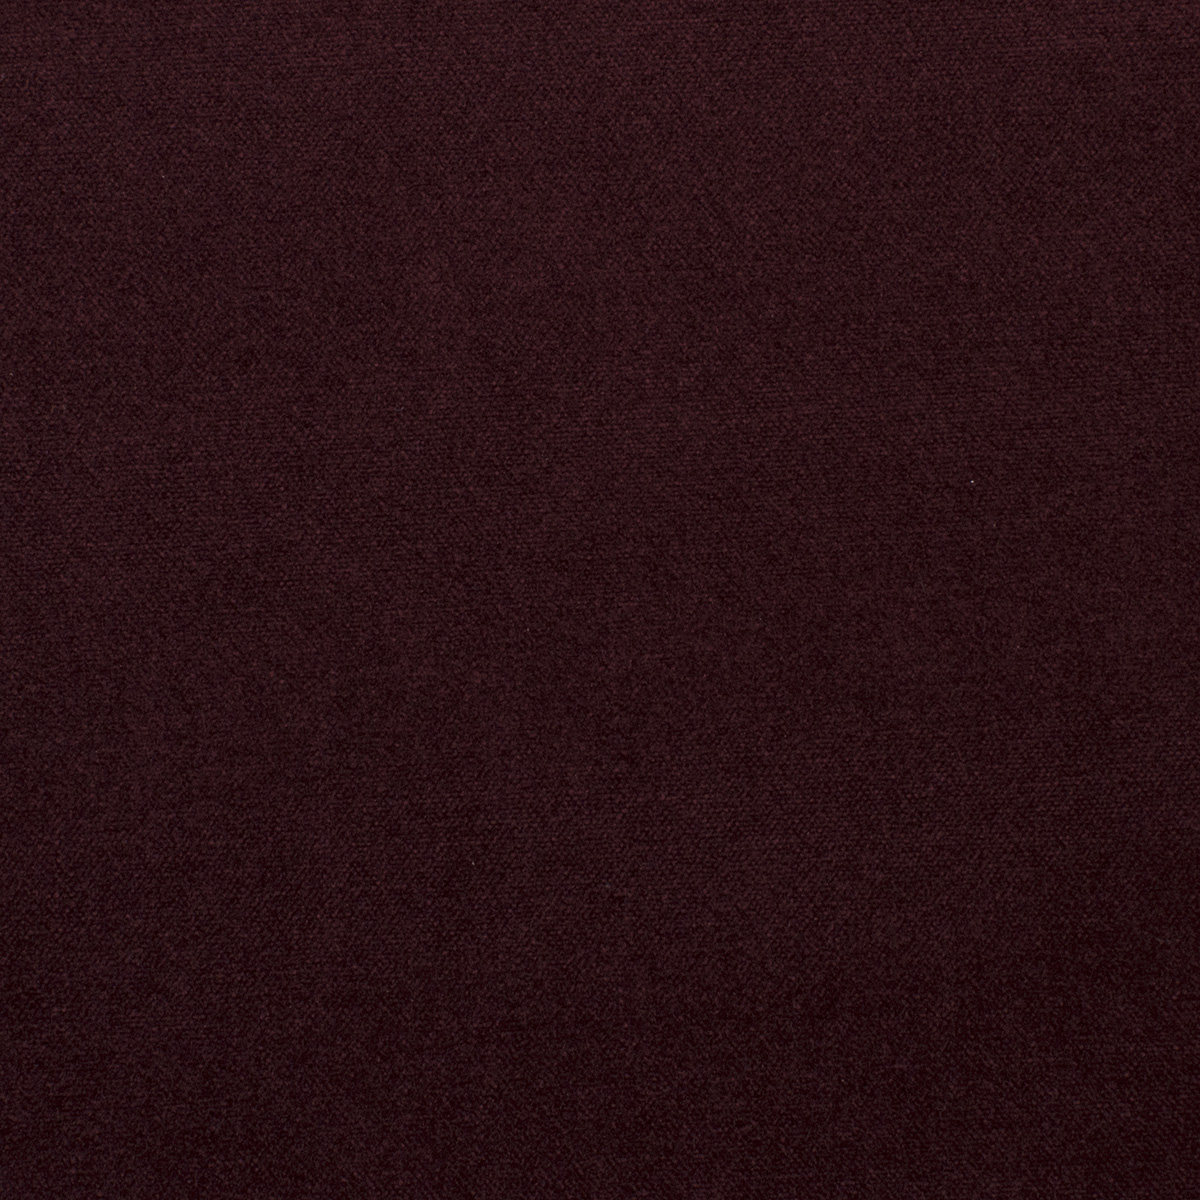 952d1a6734 Panache Velvet Cordovan | Fabric | Fabricut Contract